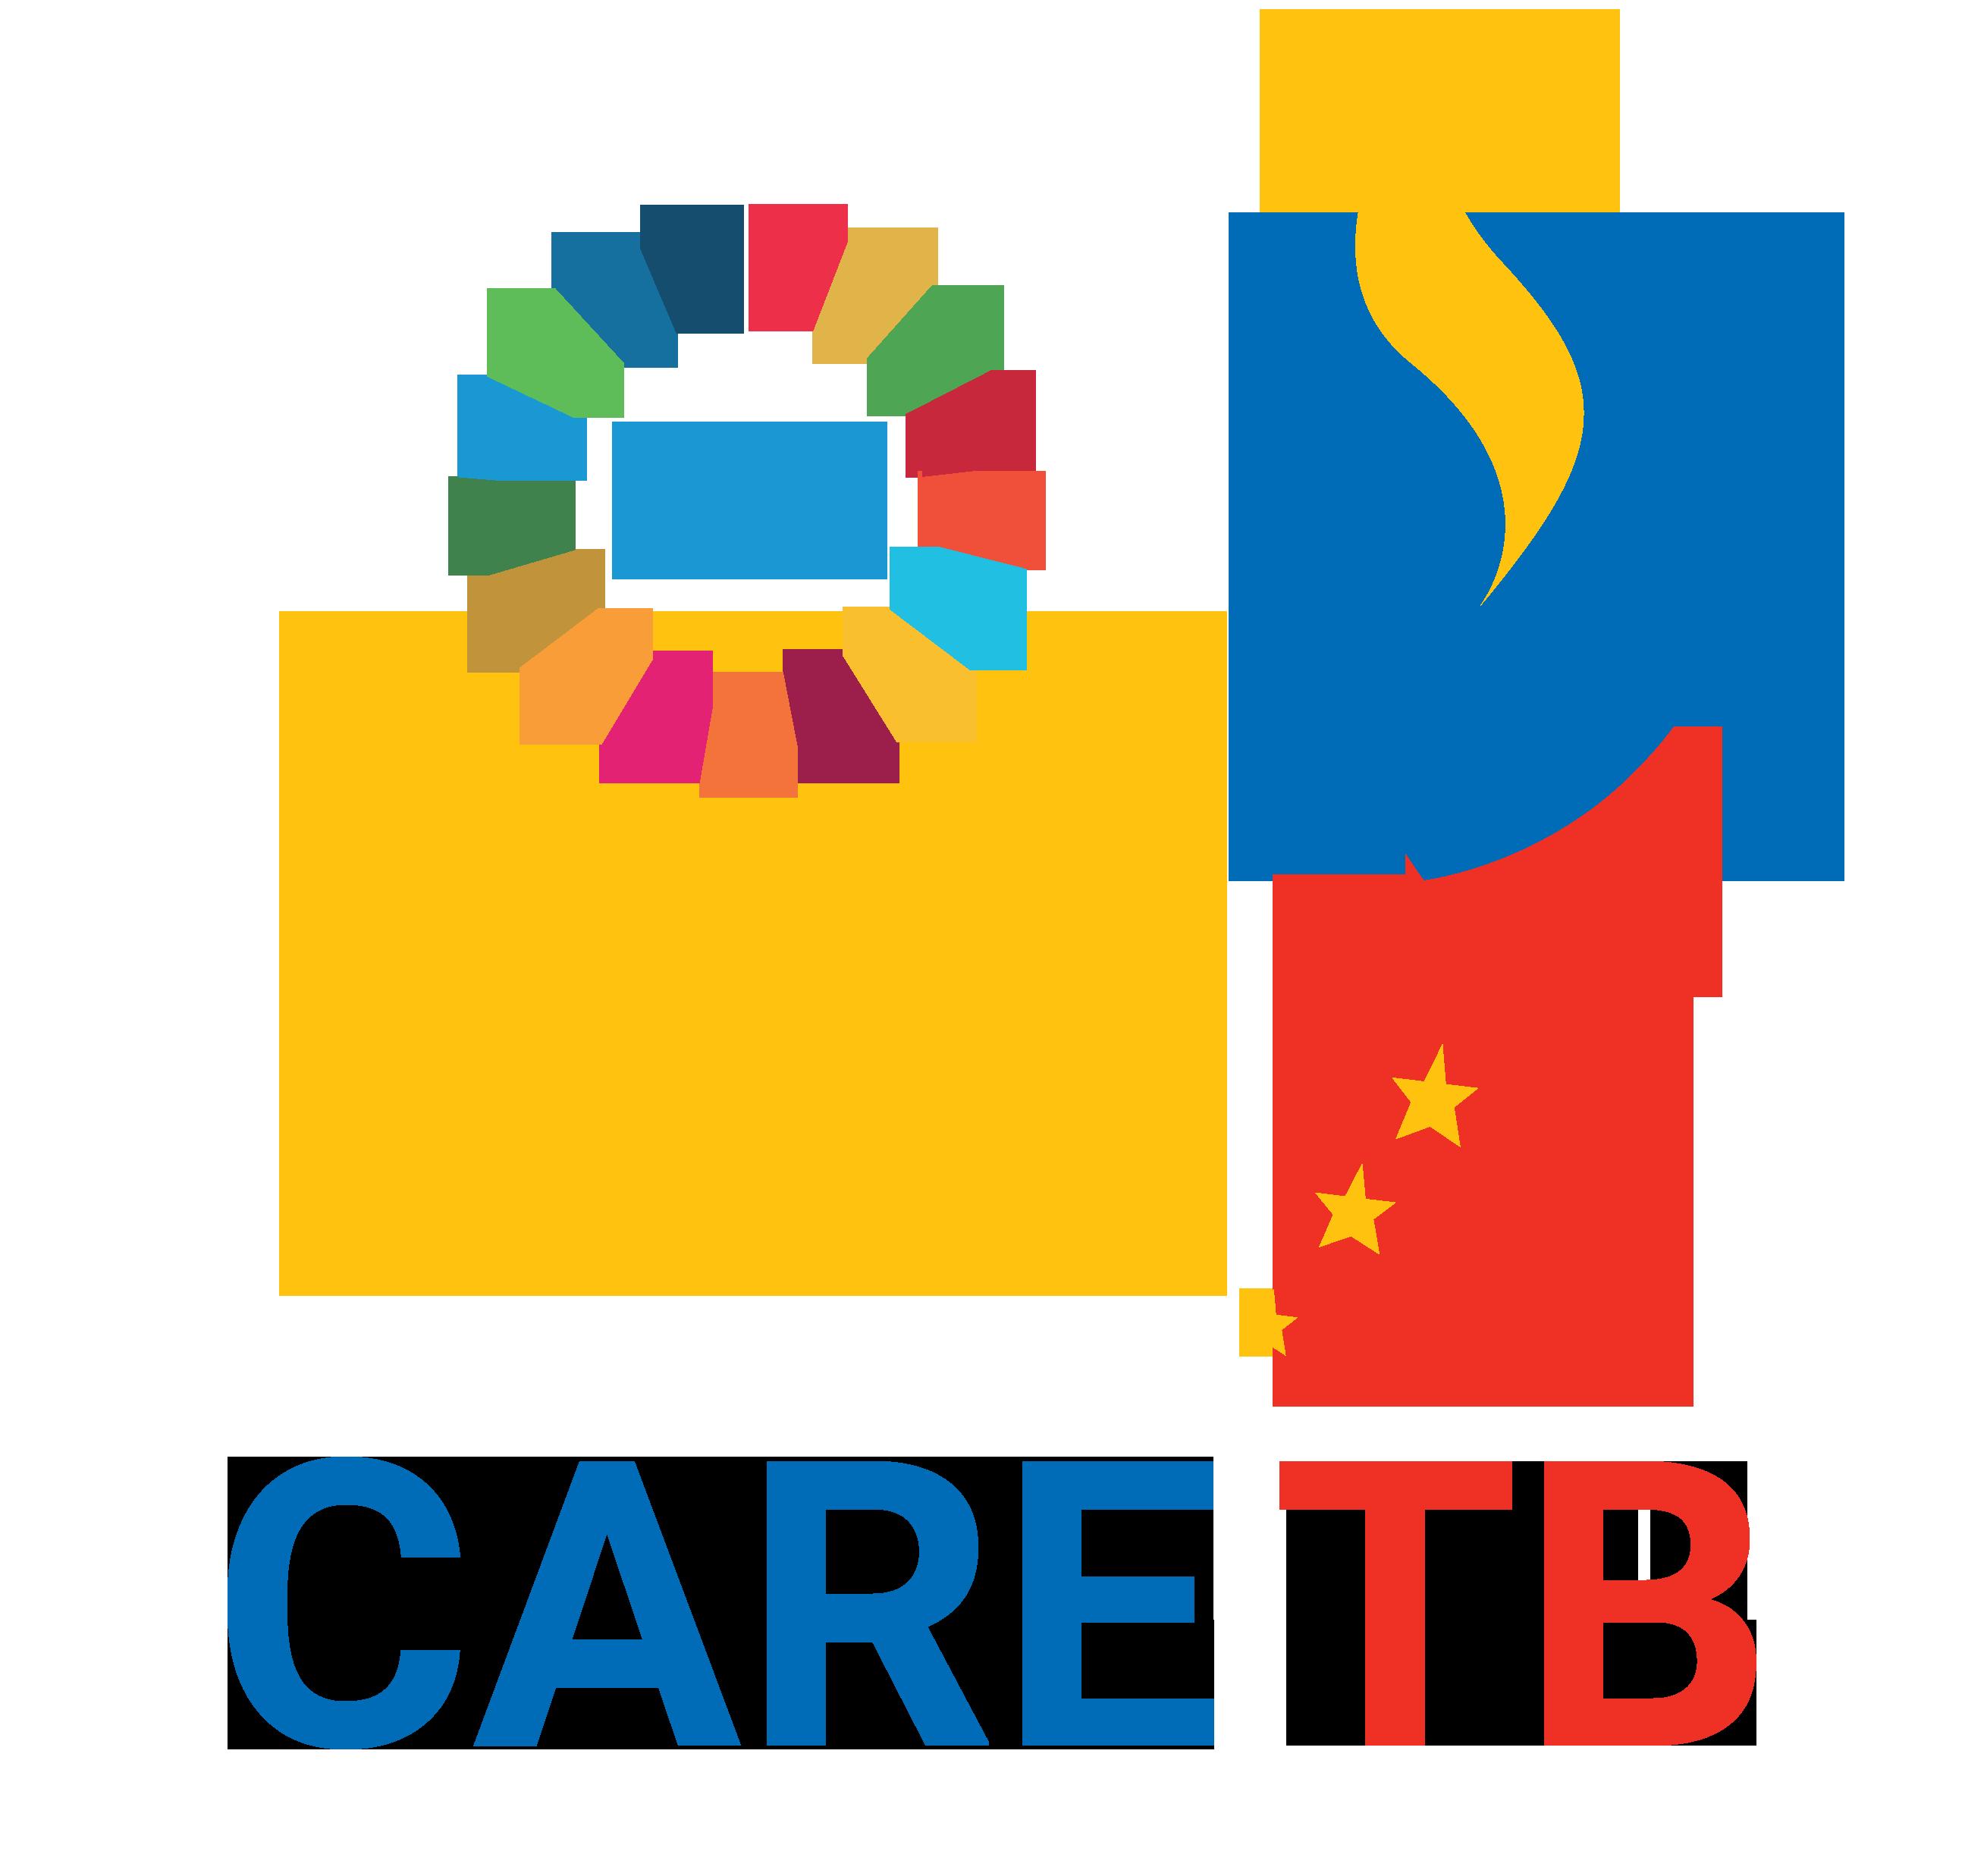 Care TB